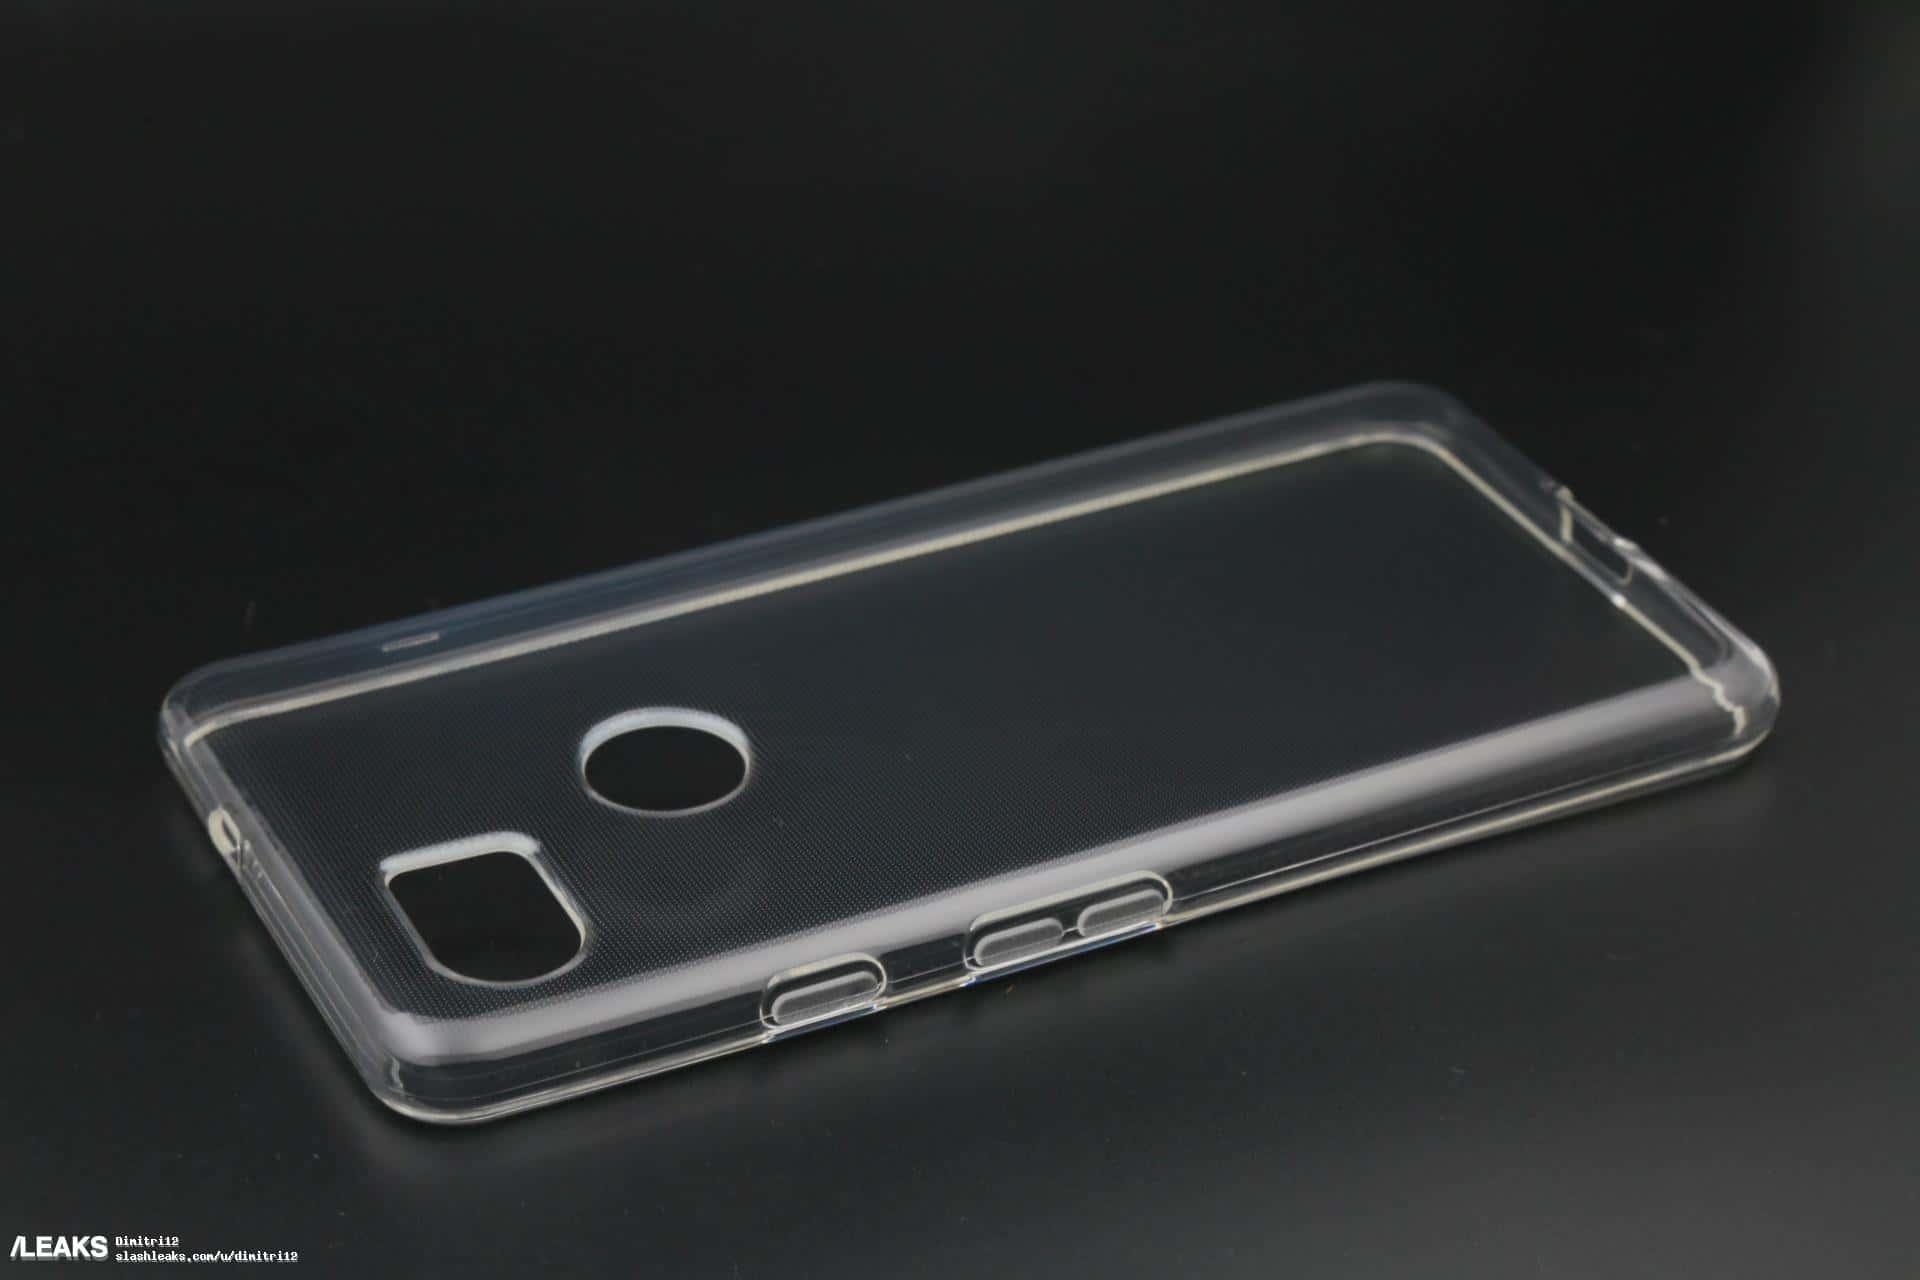 Google Pixel XL 2 Case SlashLeaks 2